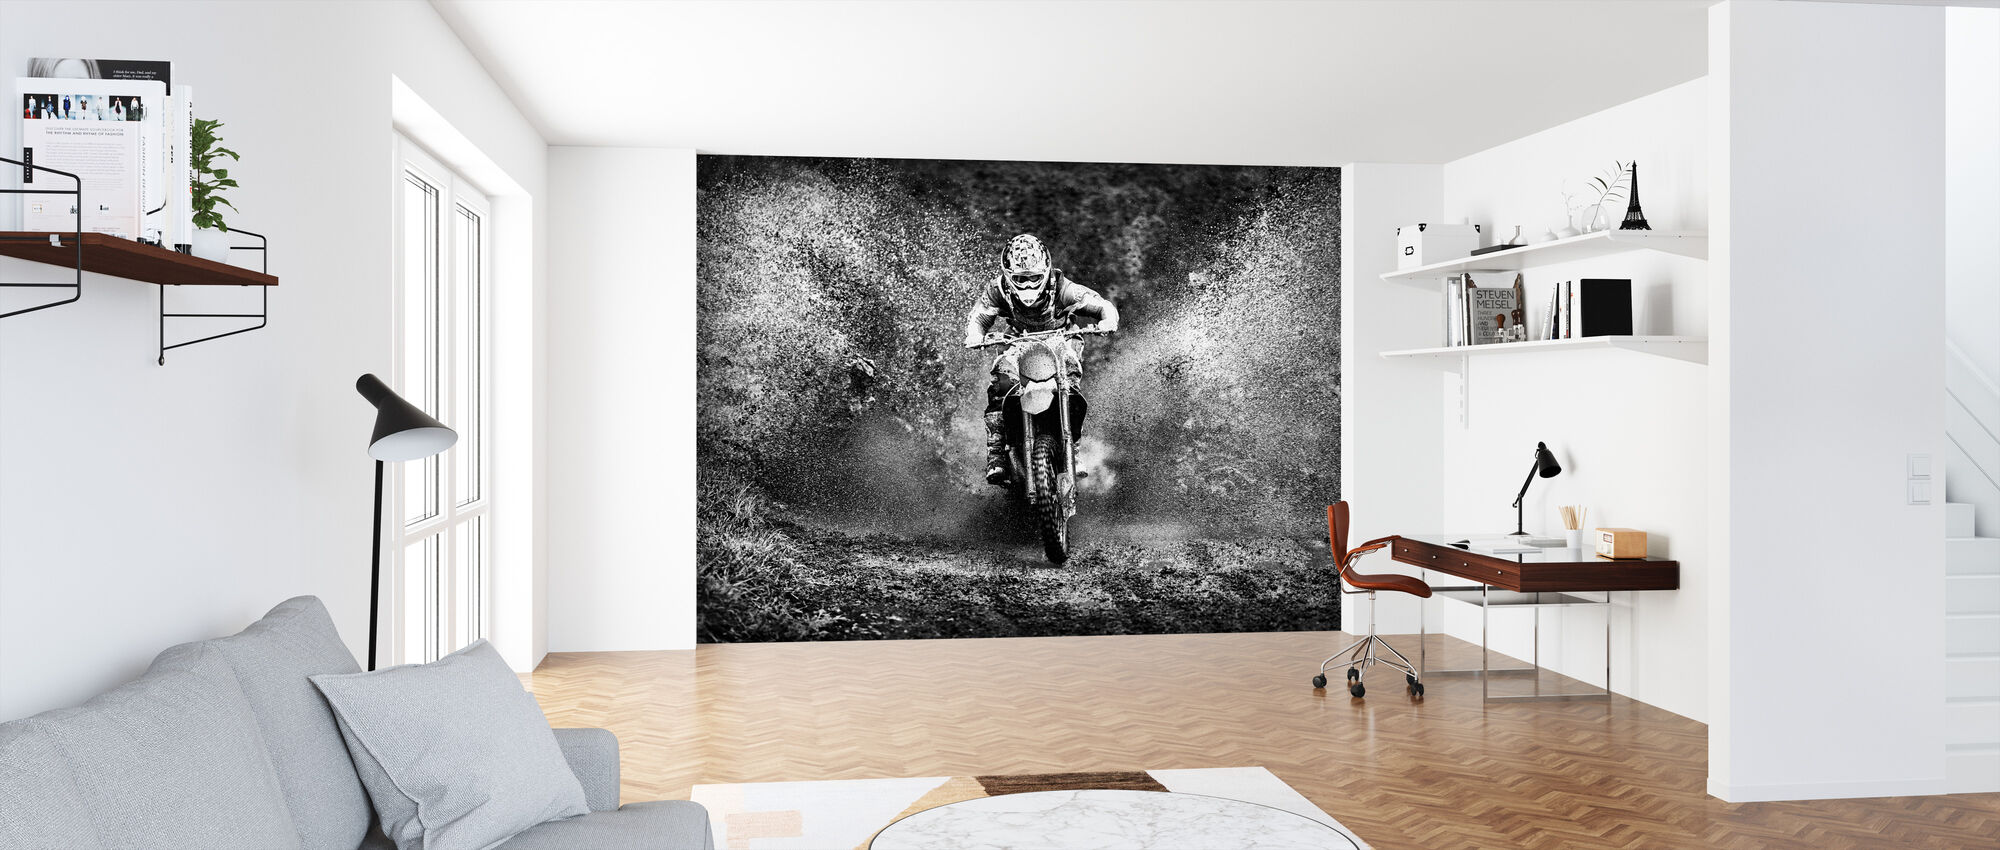 Drops - Wallpaper - Office